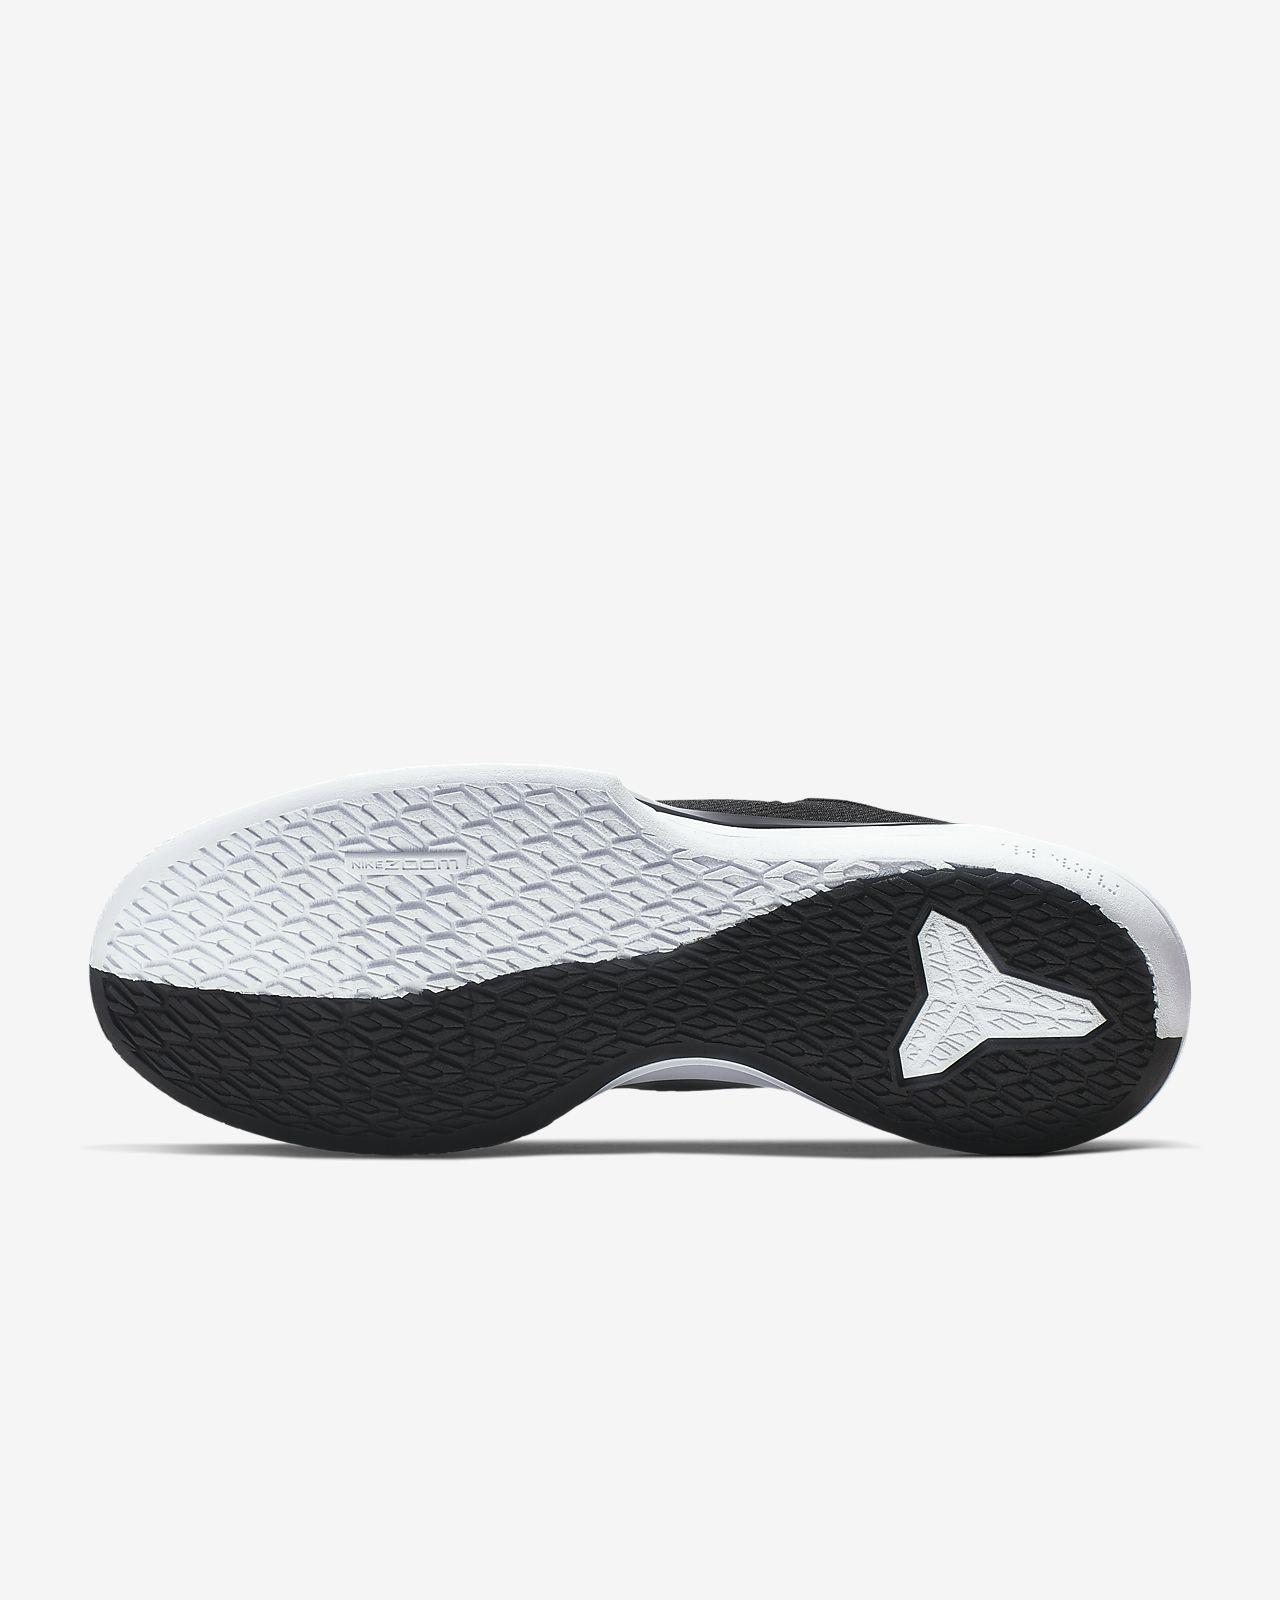 8f202f3d298 Low Resolution Mamba Focus Basketball Shoe Mamba Focus Basketball Shoe